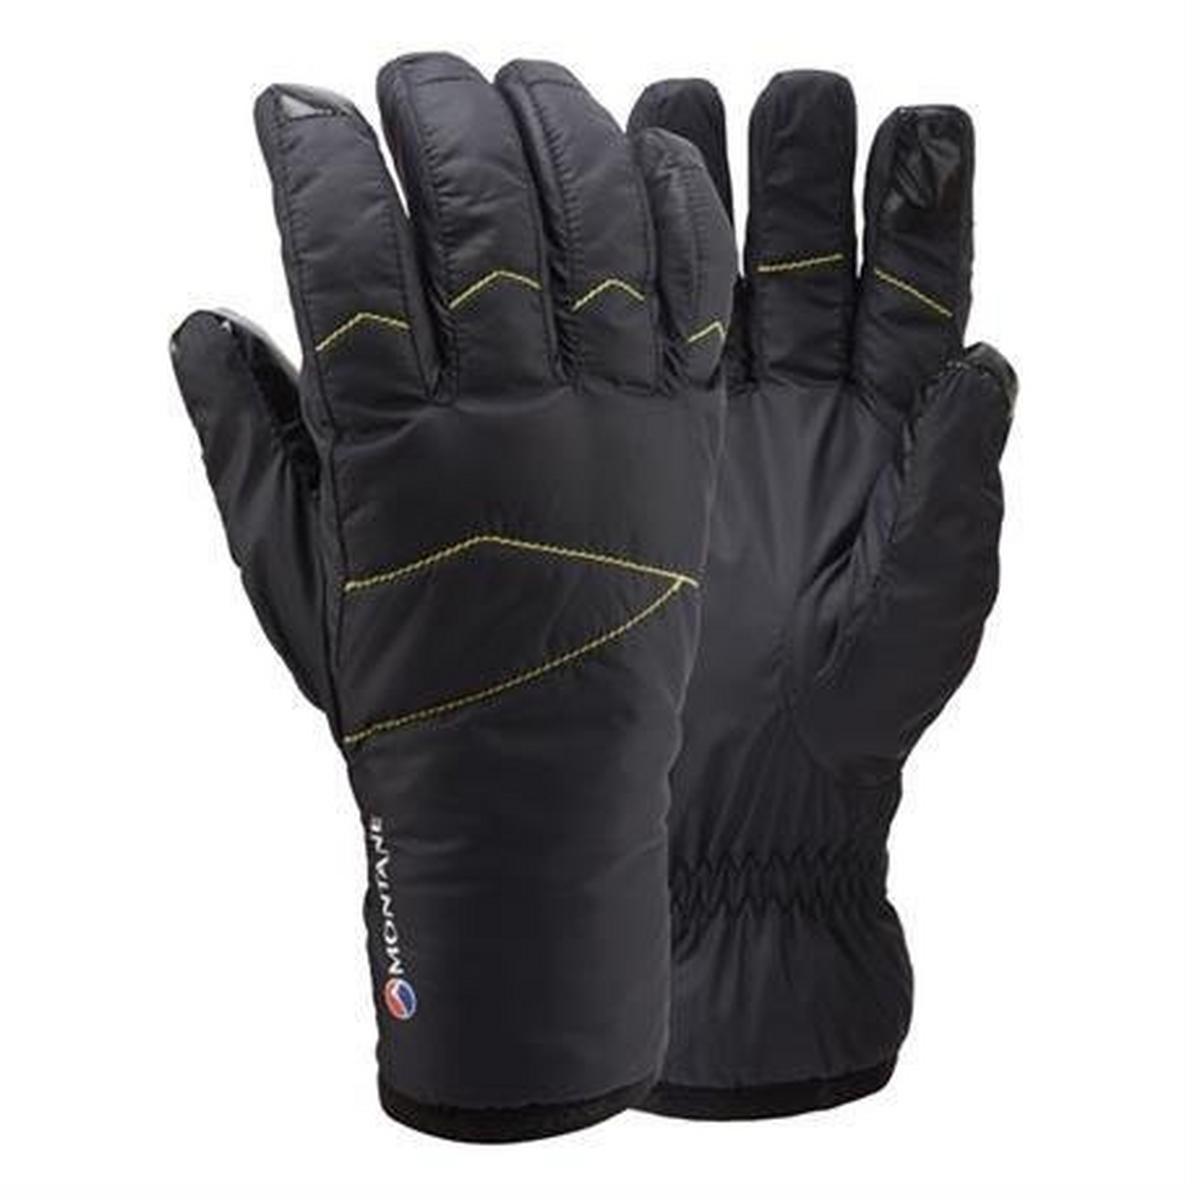 Montane Gloves INSULATED Men's Prism Black/Kiwi